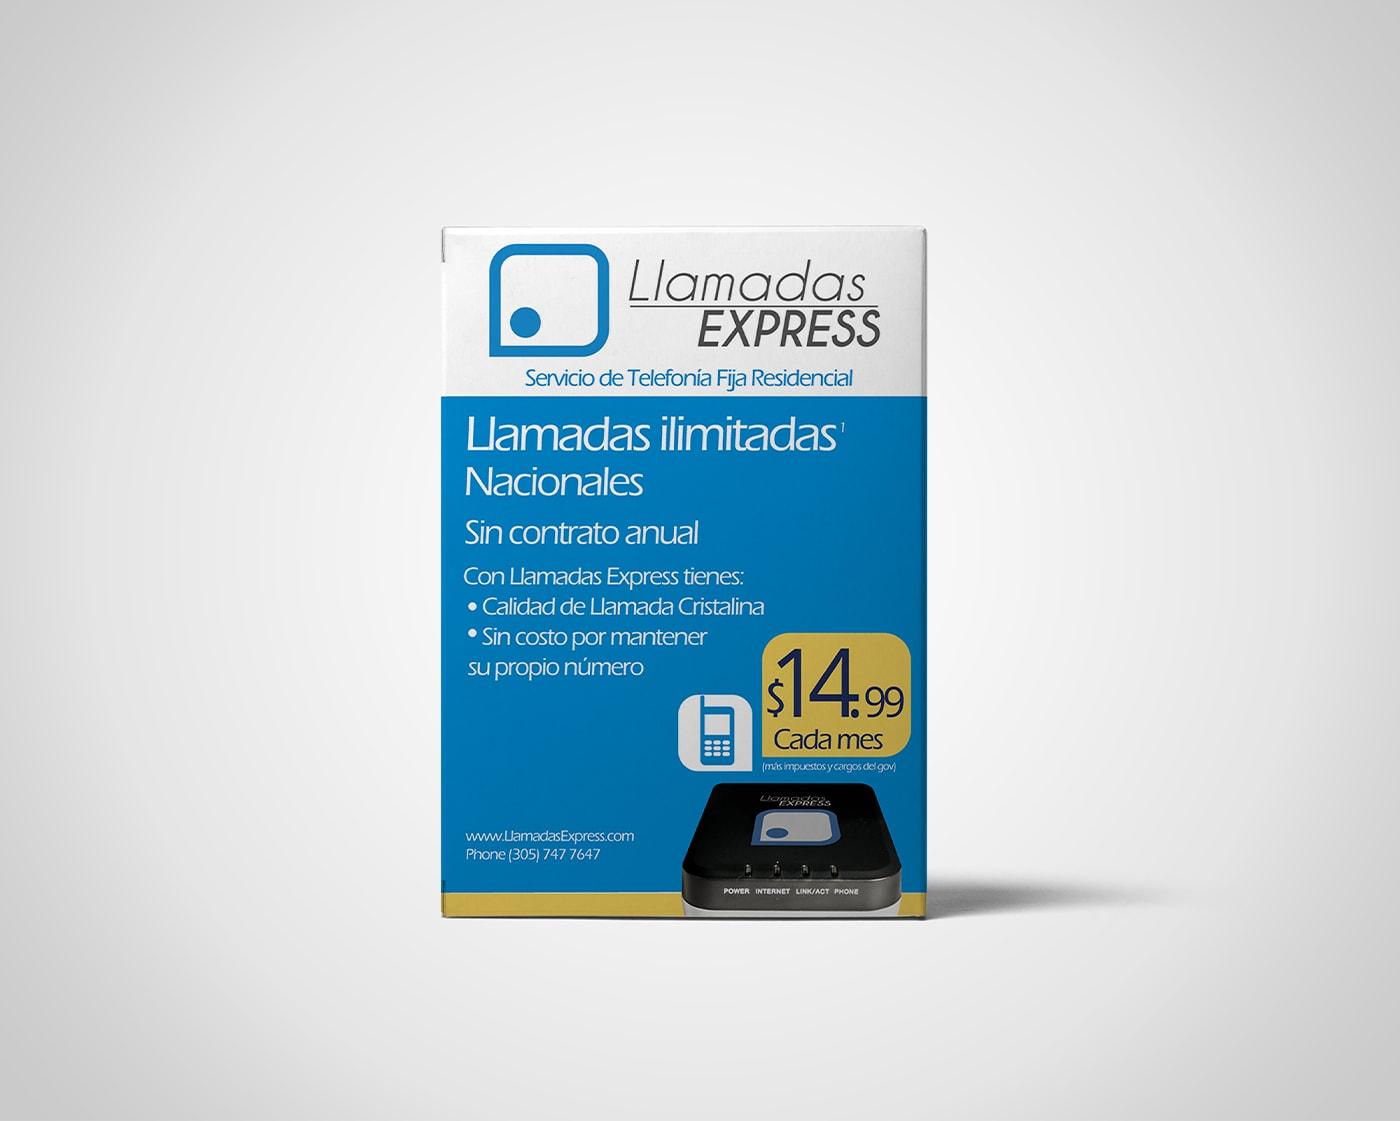 Llamadas Express – Packaging